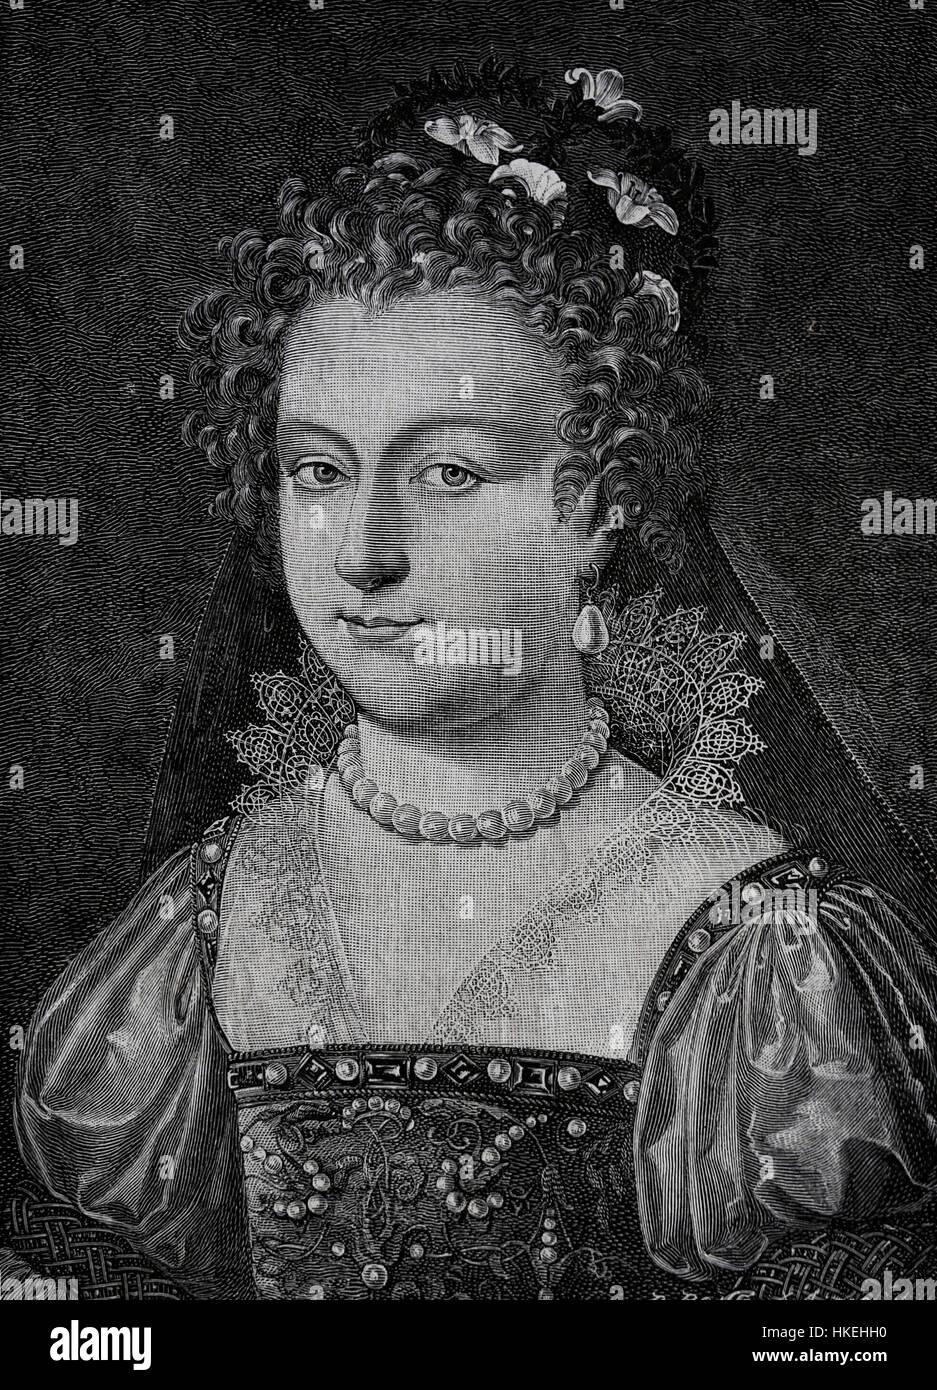 Elizabeth I of England (1533-1603). Queen  of England and Ireland. Tudor dynasty. Engraving, 19th century. - Stock Image